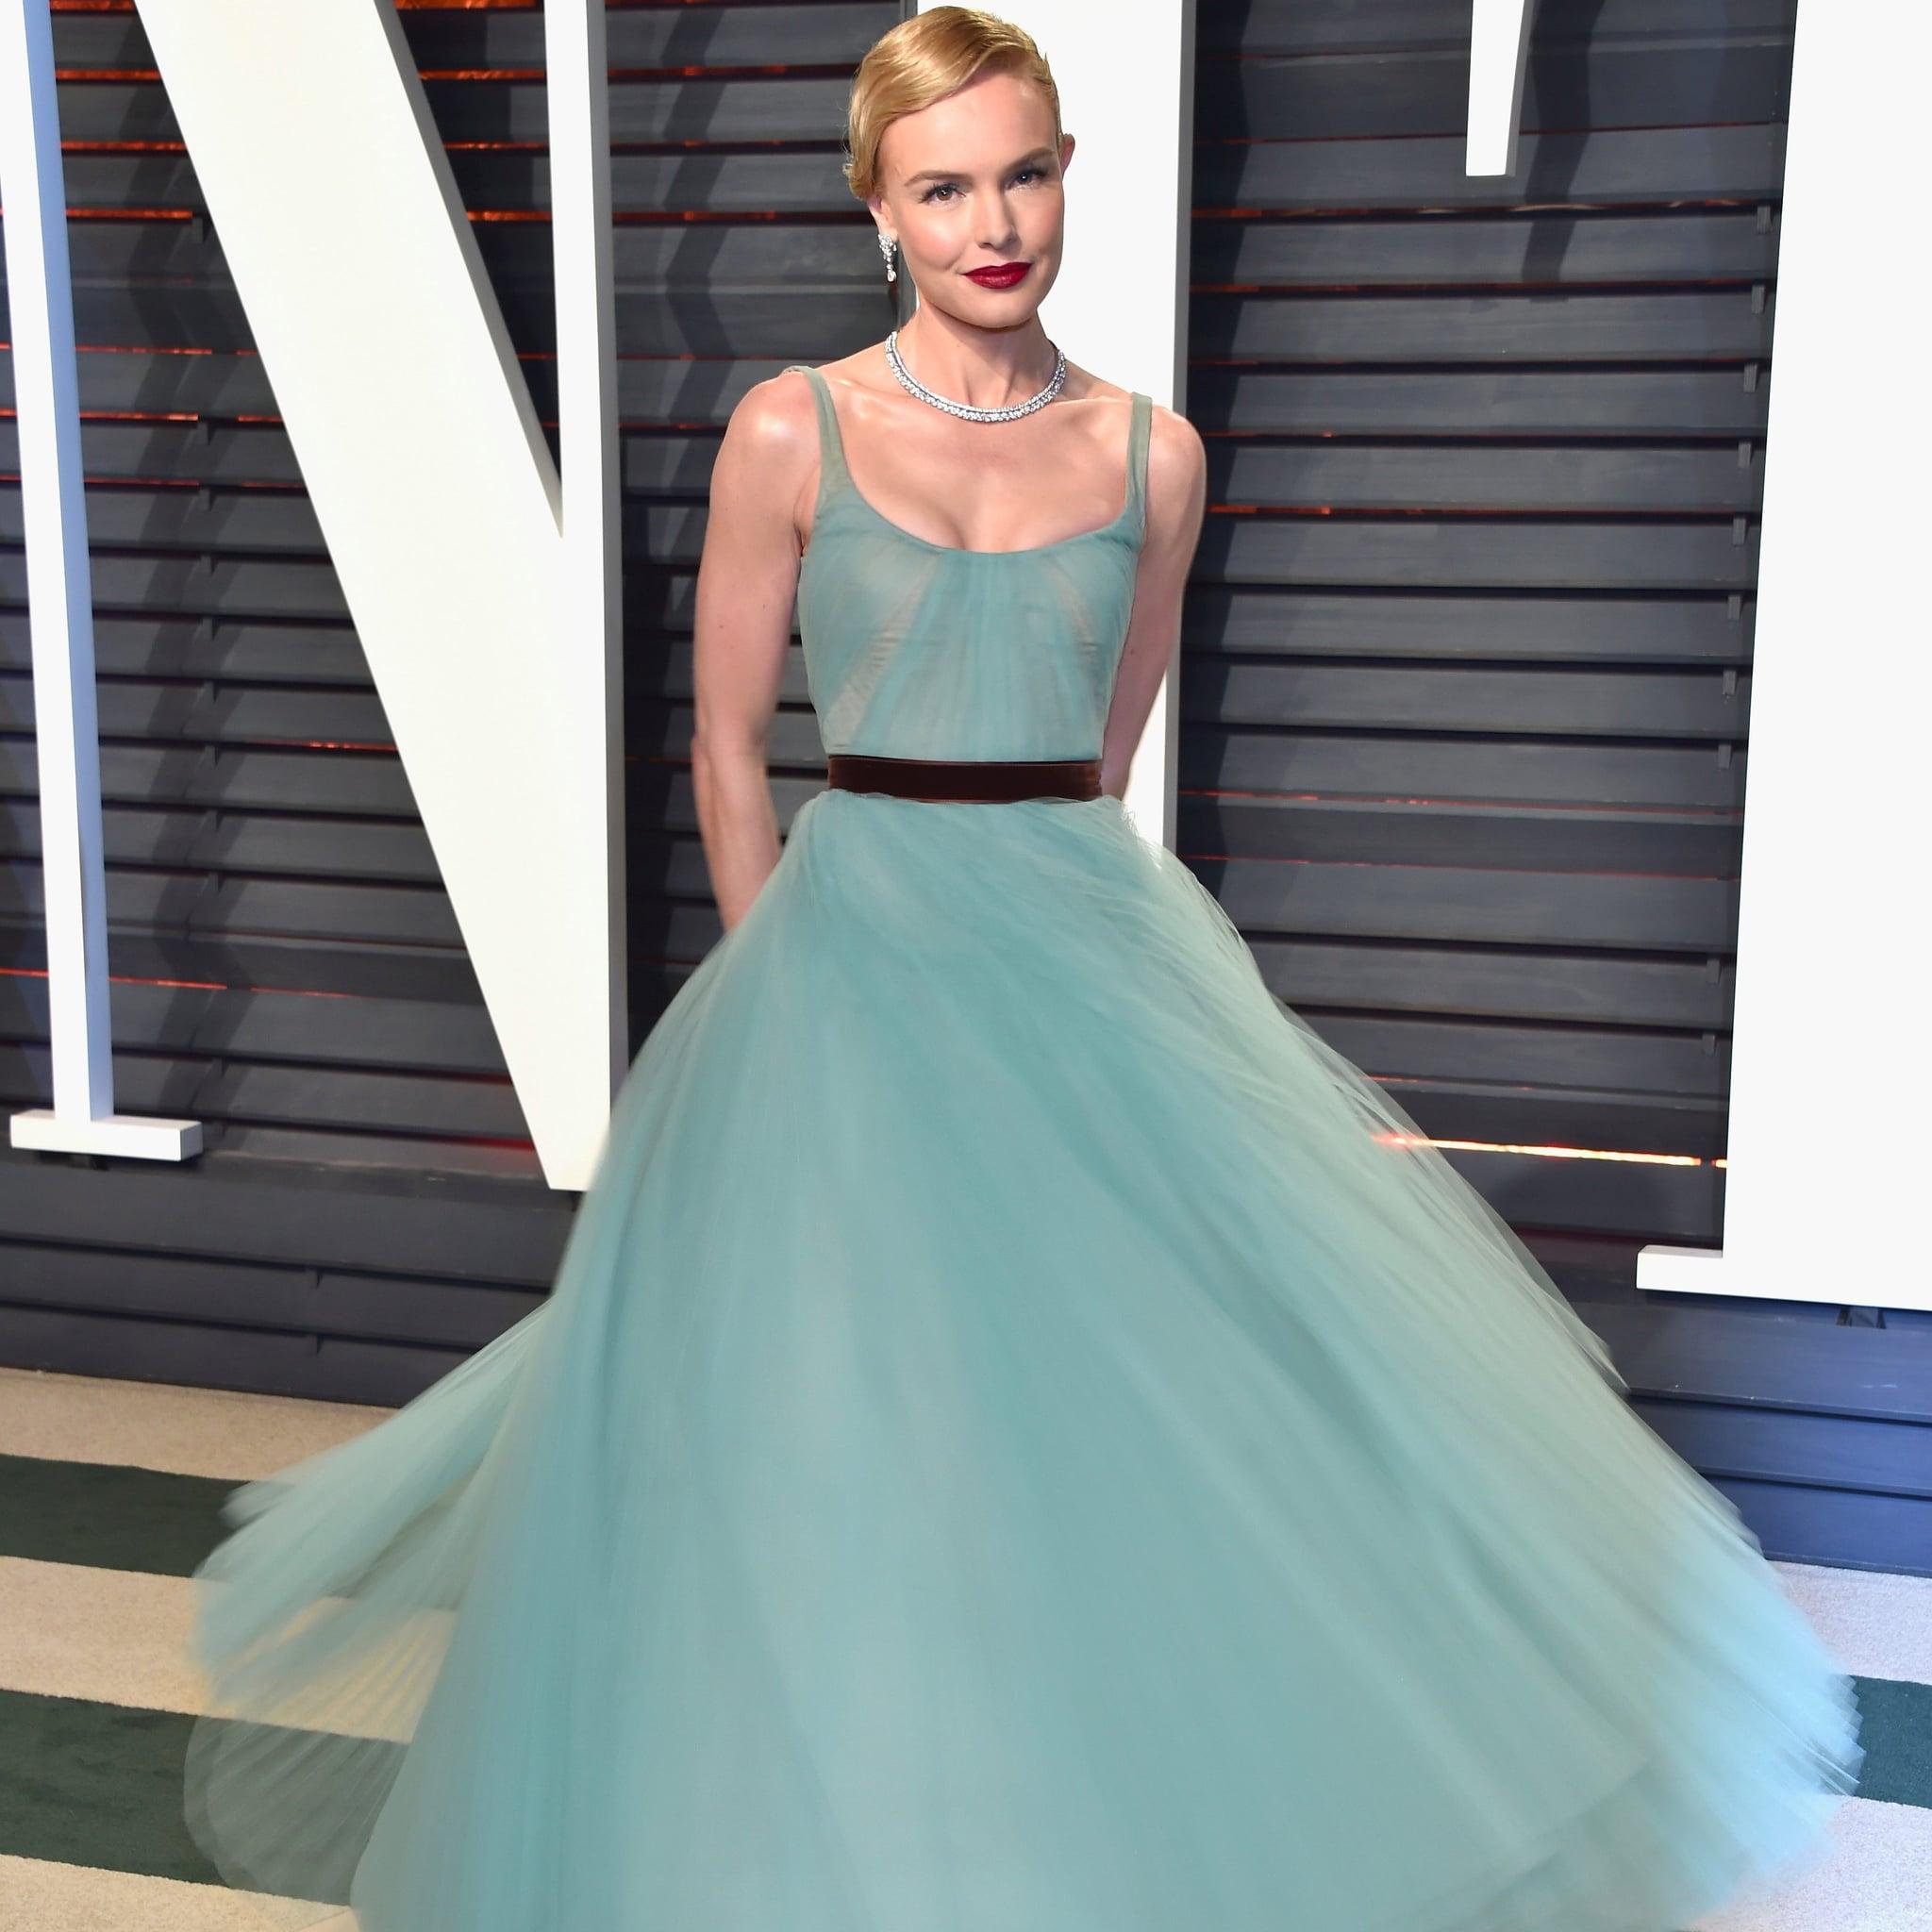 Disney Dresses at the Oscars 2017 | POPSUGAR Fashion